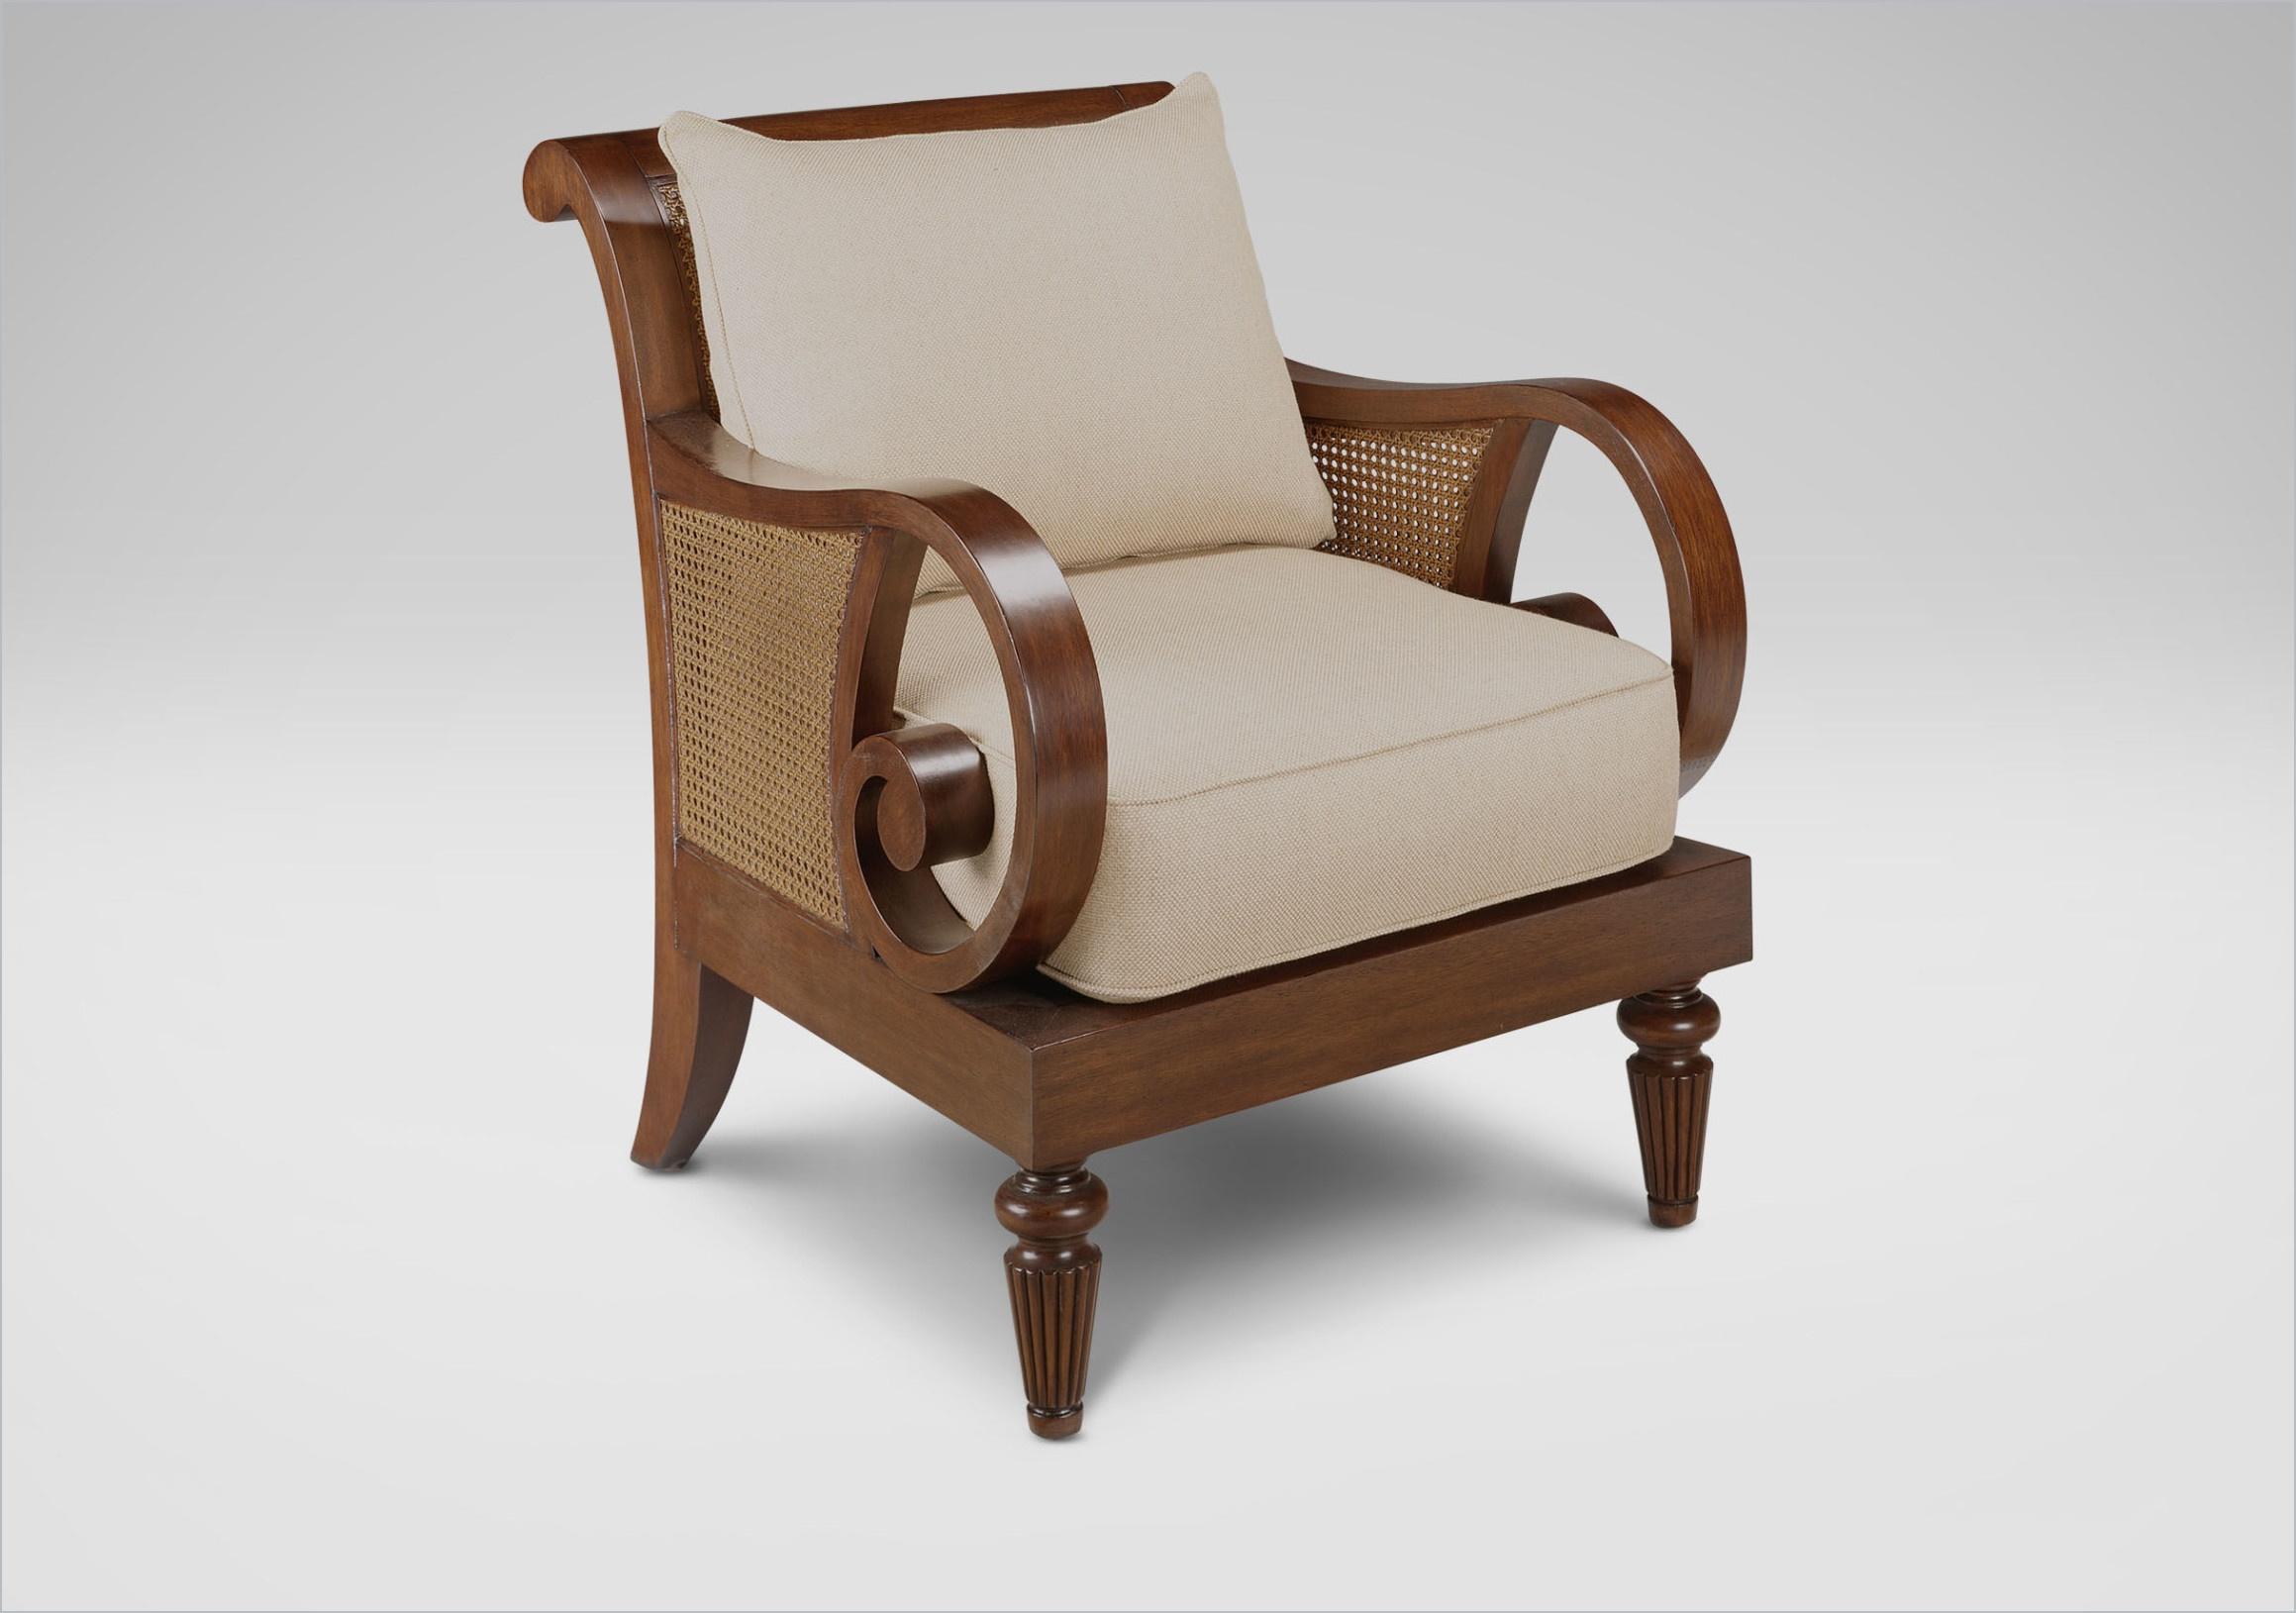 Ethan Allen Slipcovers | Ethan Allen Sleeper Sofa | Ethan Allen Couches